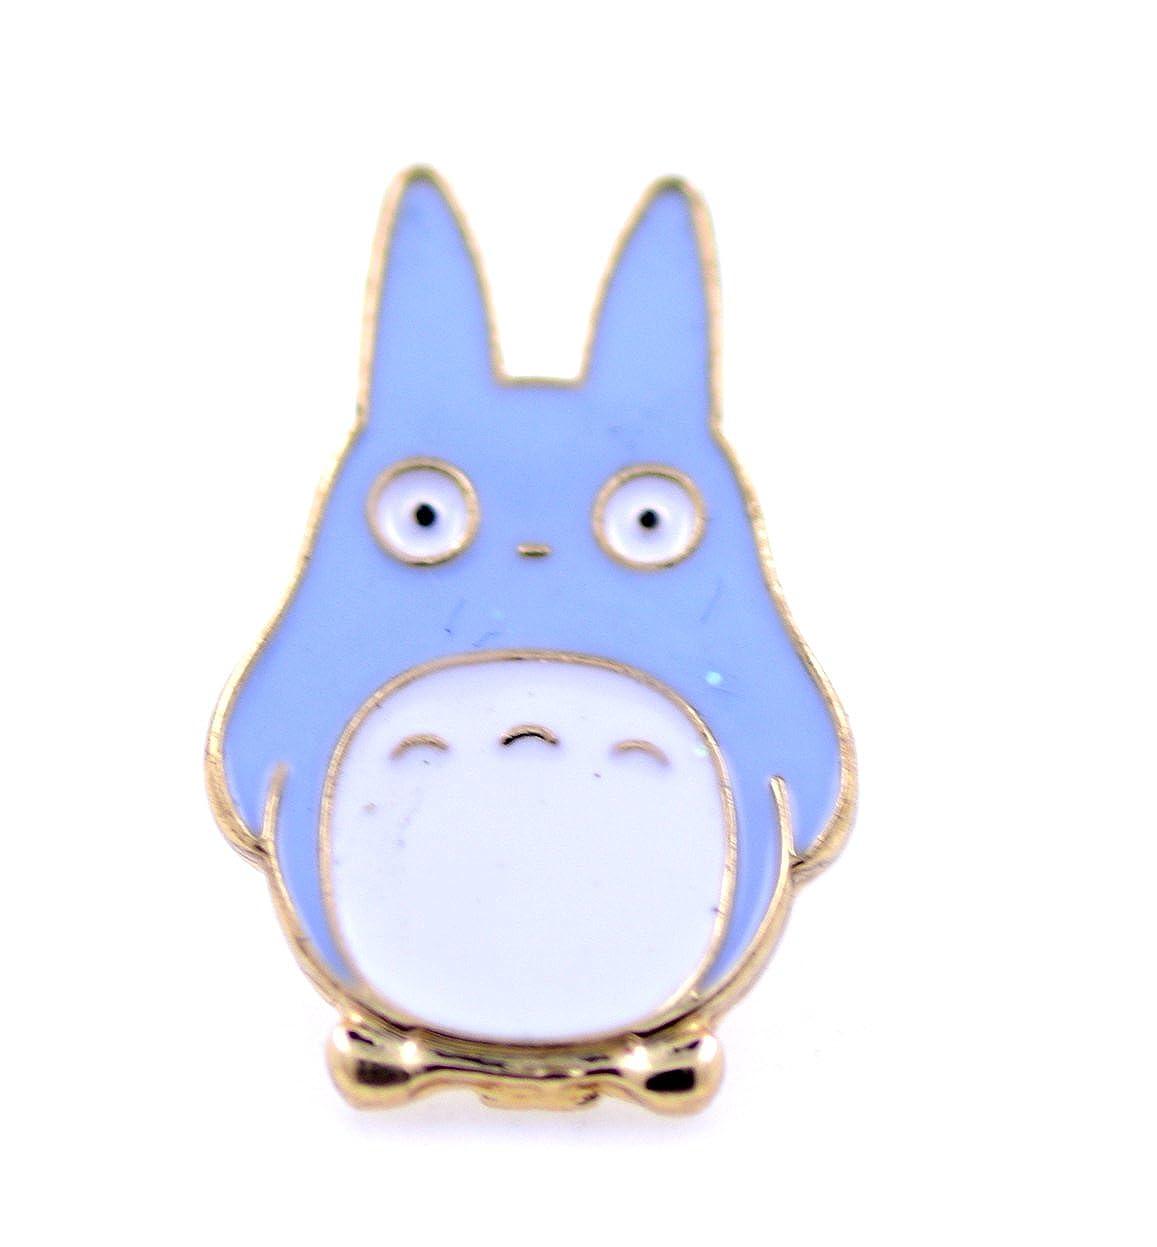 PendentifLizzyoftheflowers Broche/pin's en émail « Mon voisin Totoro ». LizzyoftheflowersA2970